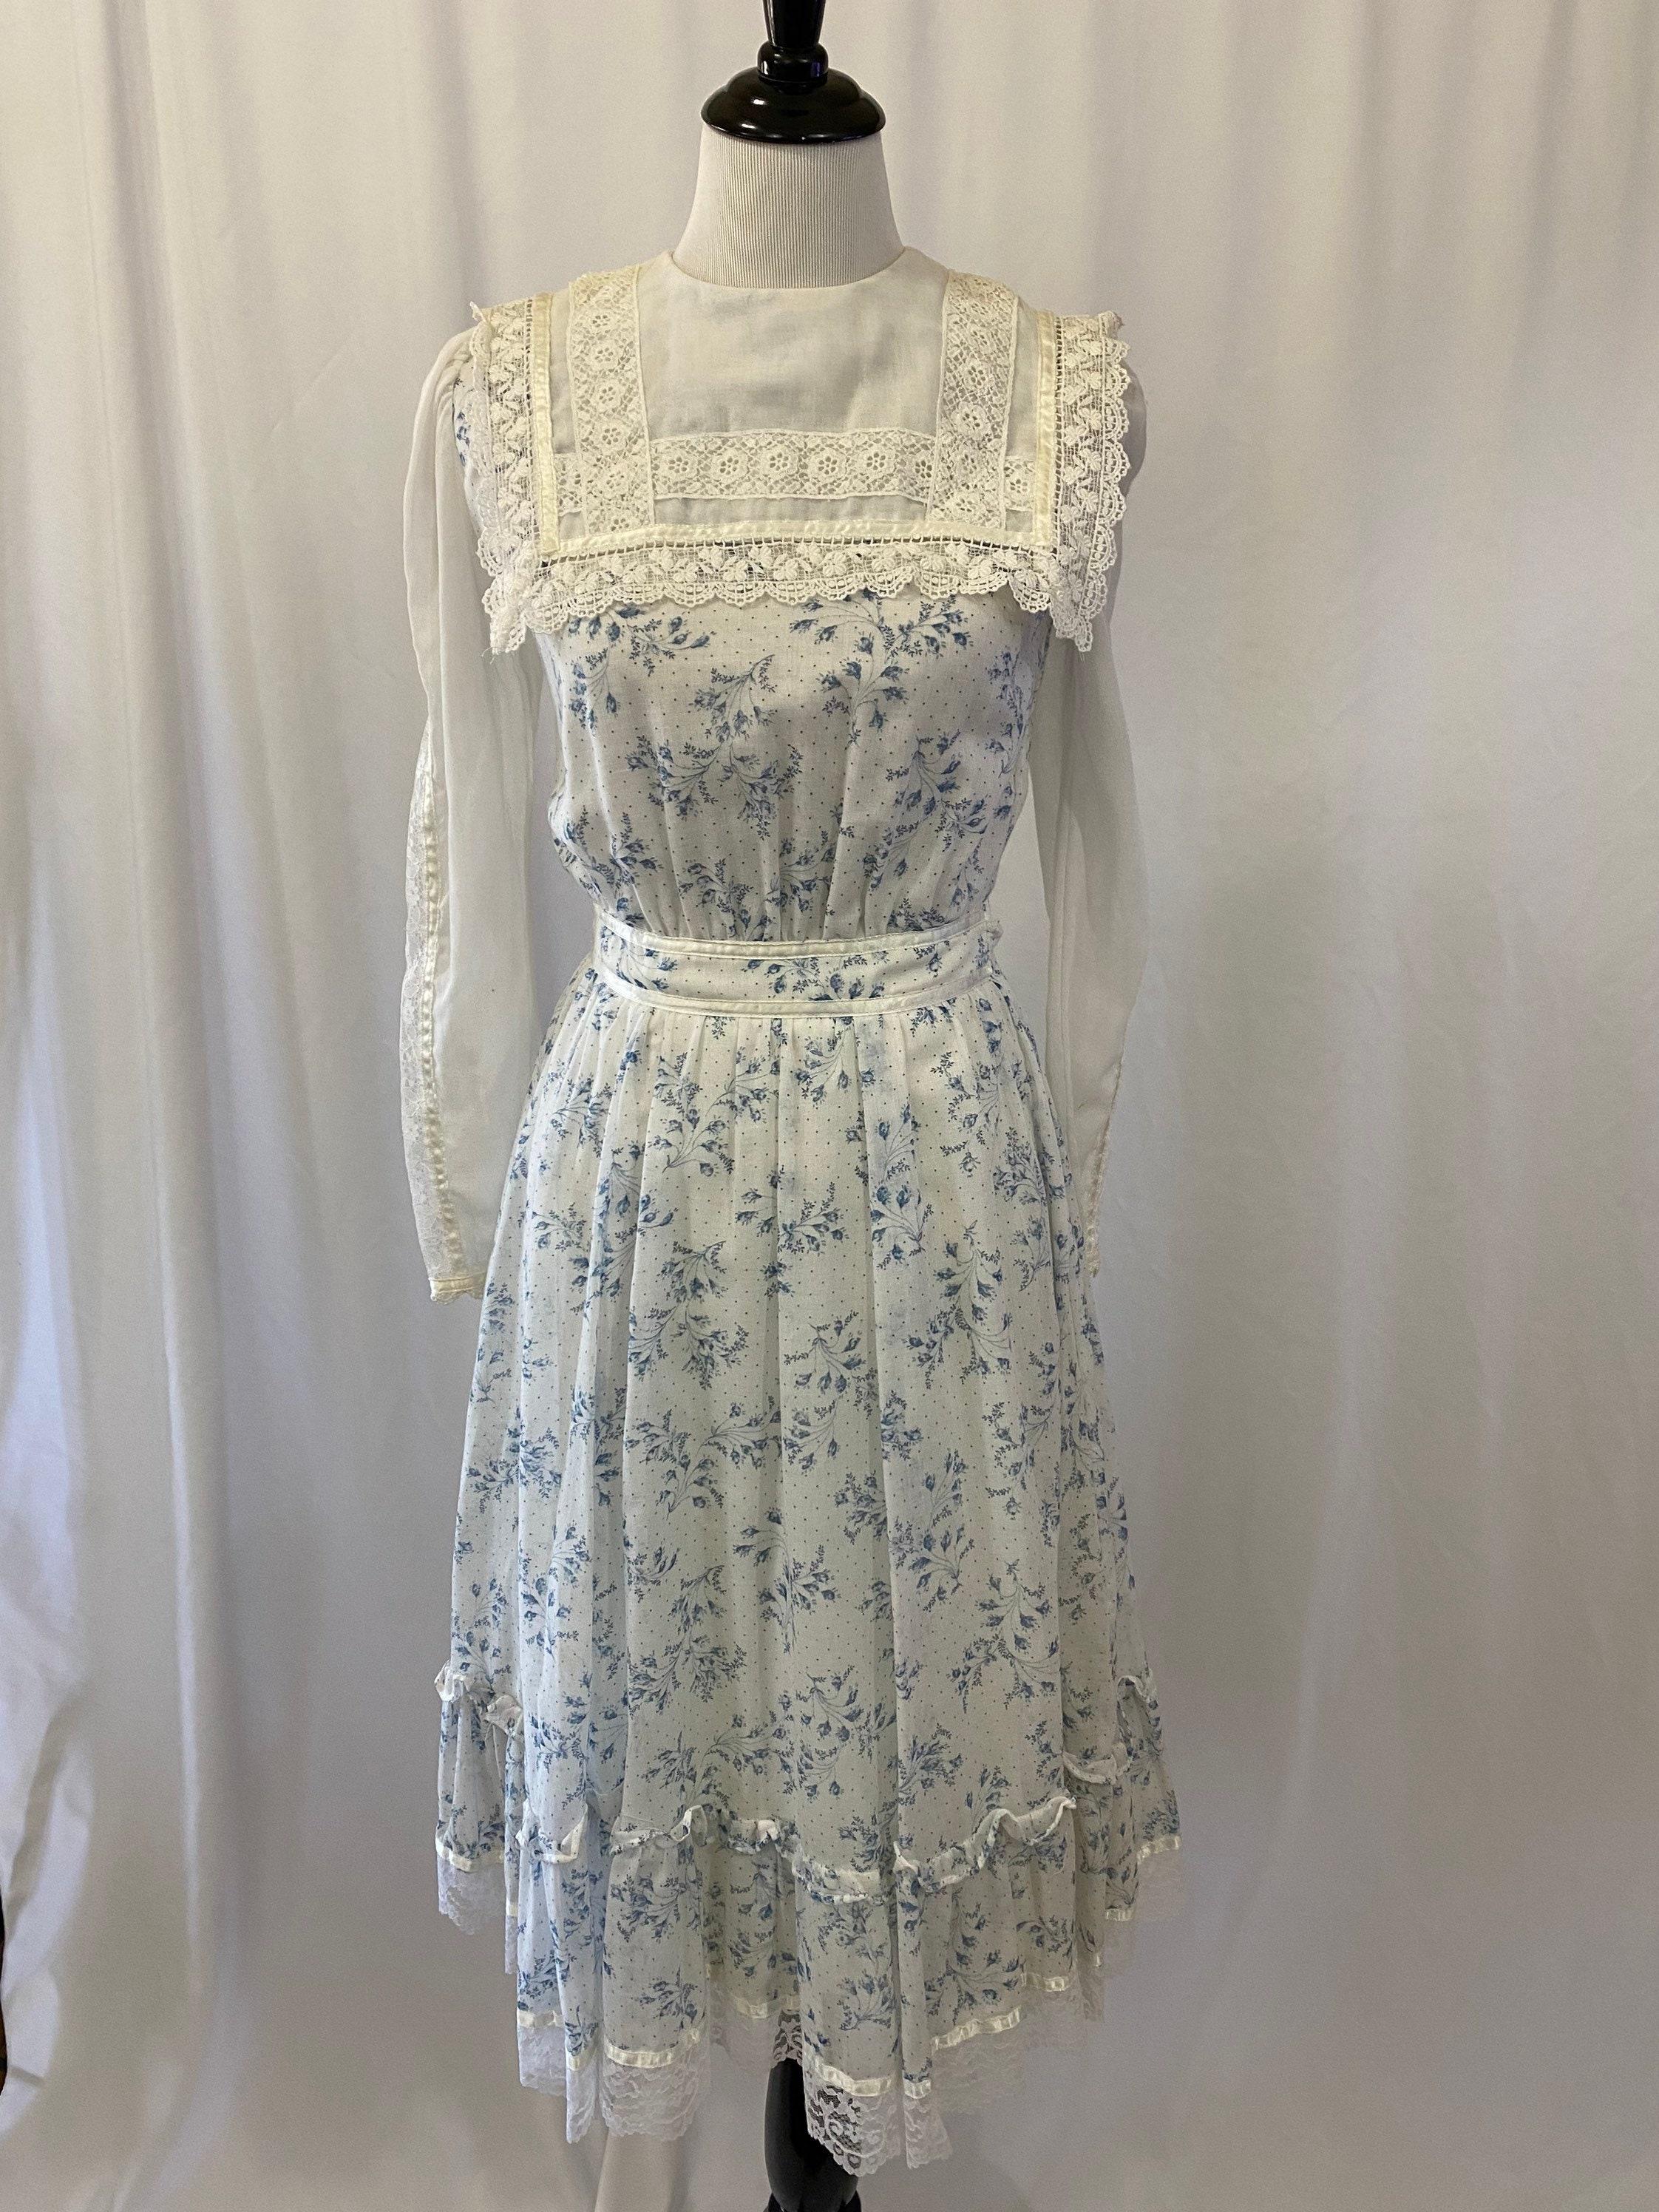 80s Dresses | Casual to Party Dresses Vintage 1980S Gauzy Blue Floral Gunne Sax By Jessica Edwardian Style Dress $25.00 AT vintagedancer.com